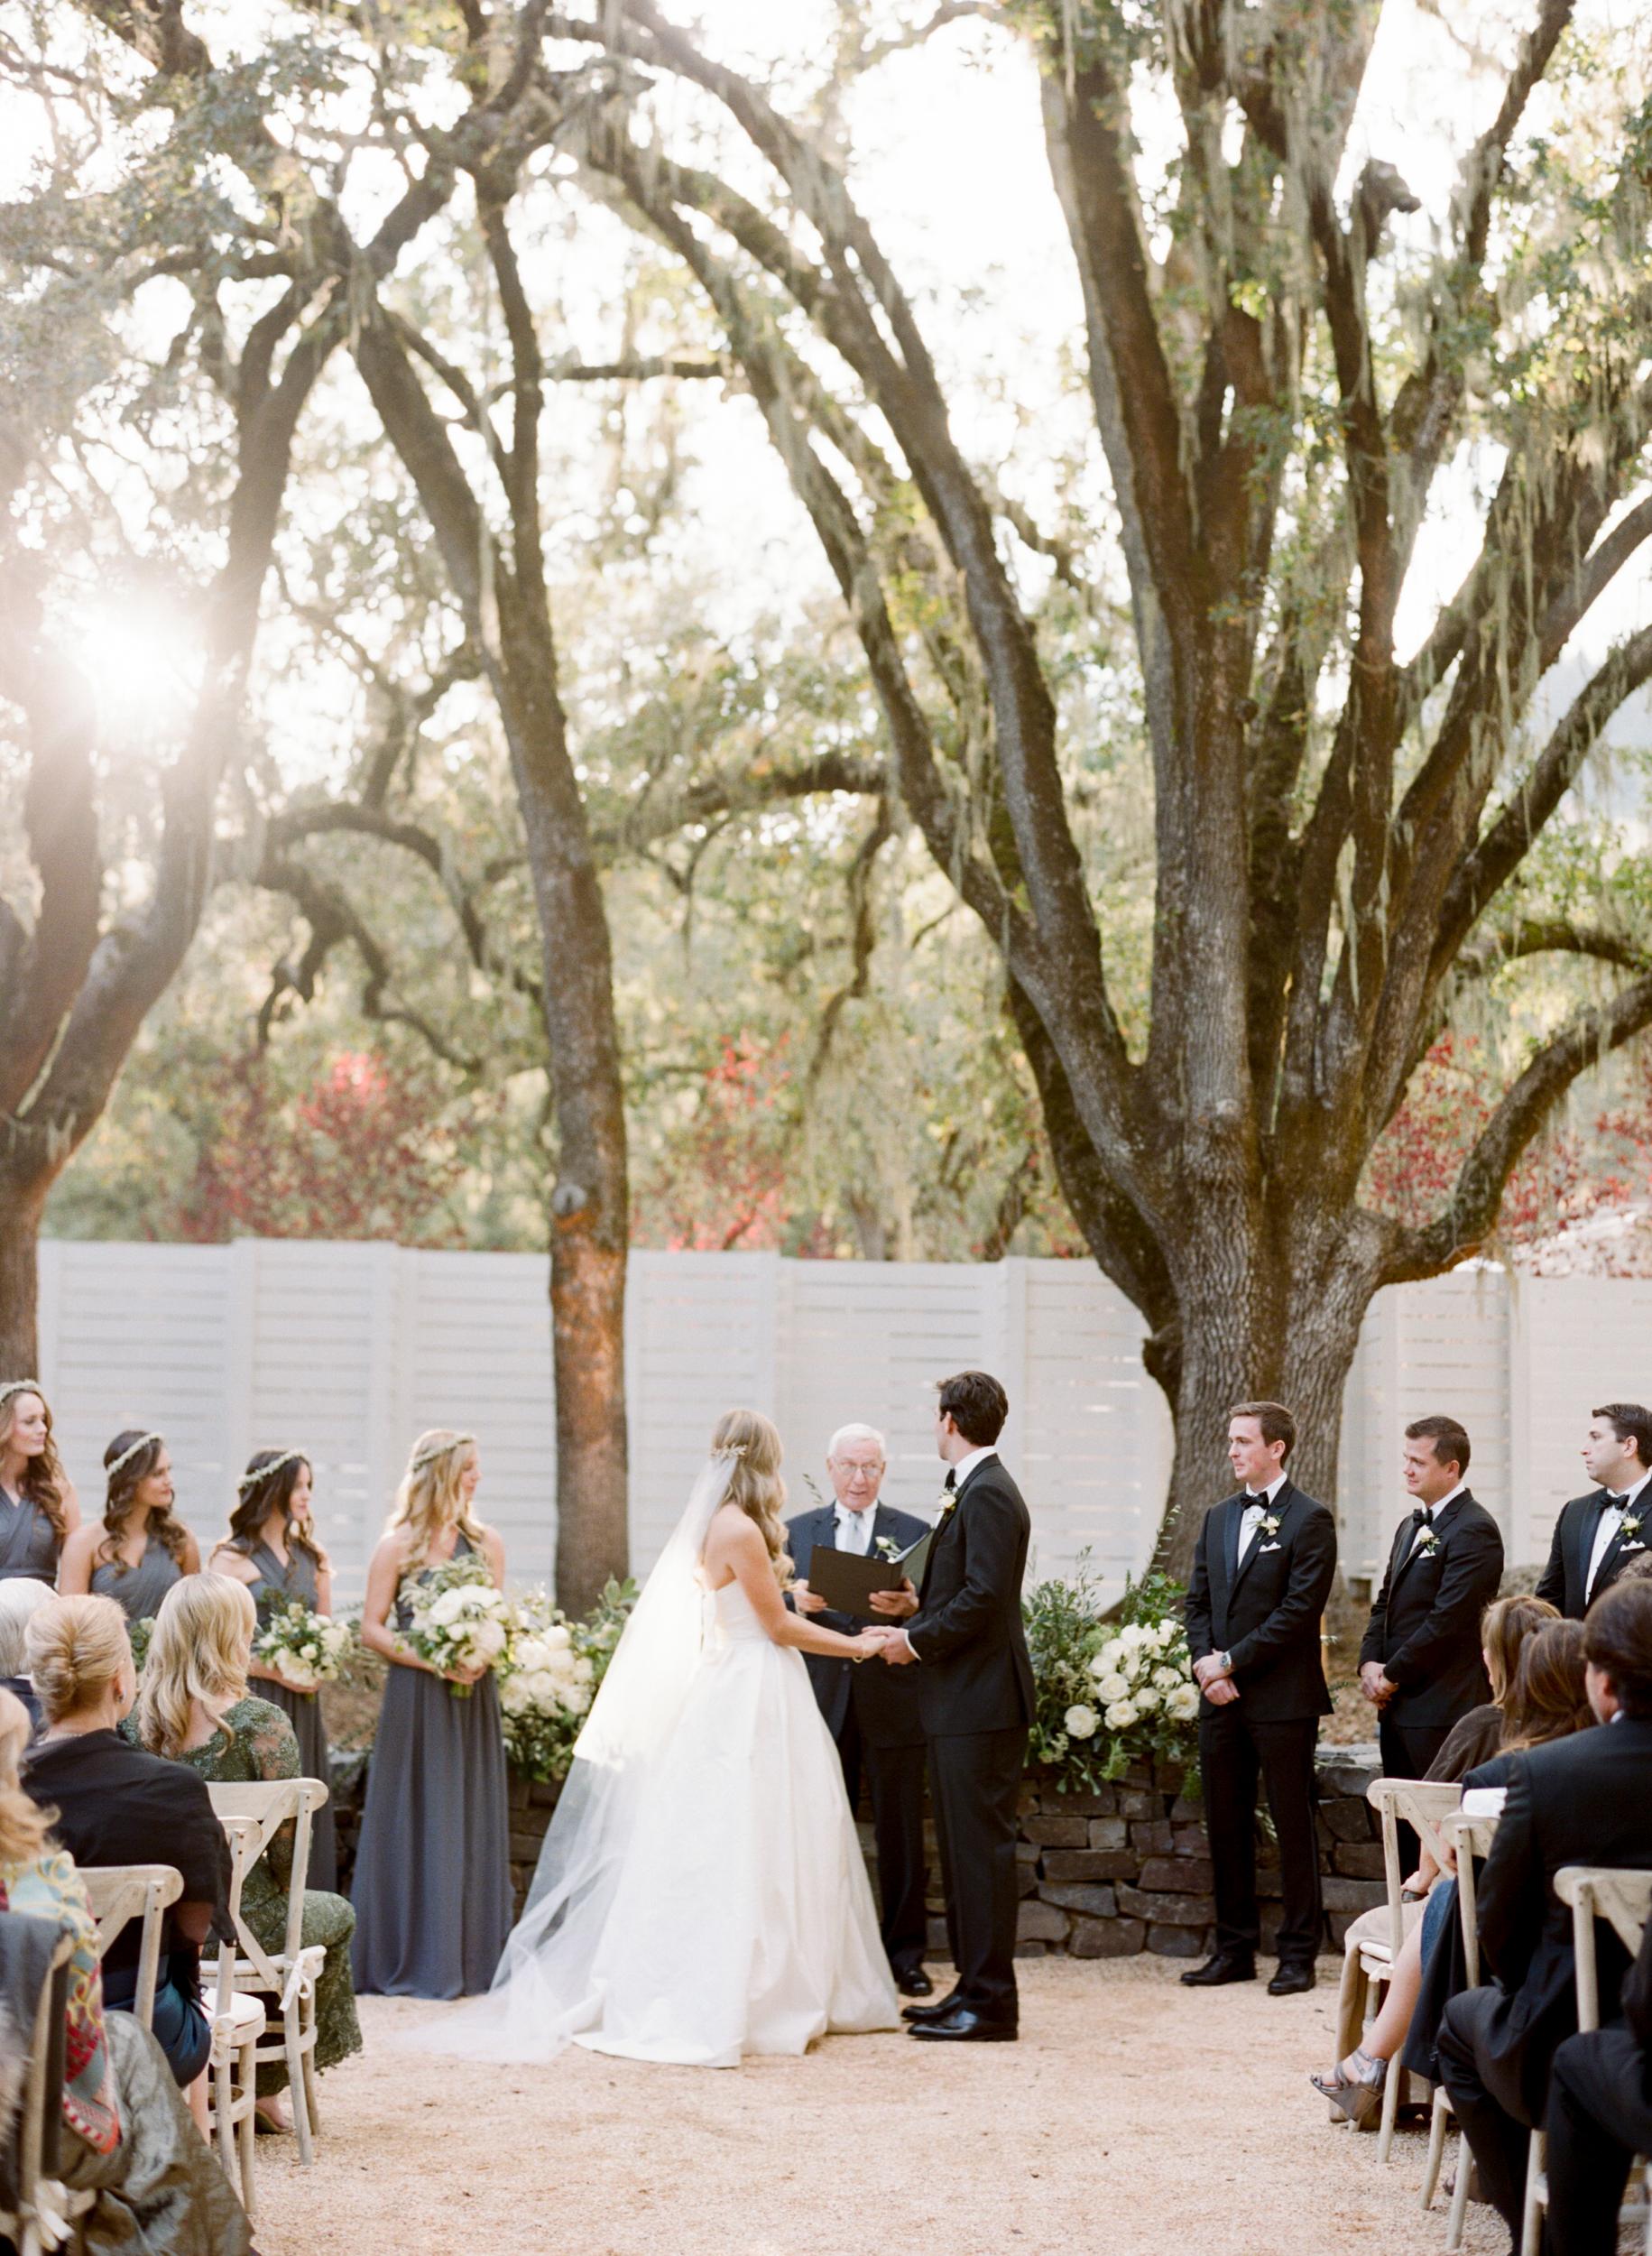 SylvieGil-Durham-Ranch-Organic-Ethereal-Rustic-Ceremony-Wedding